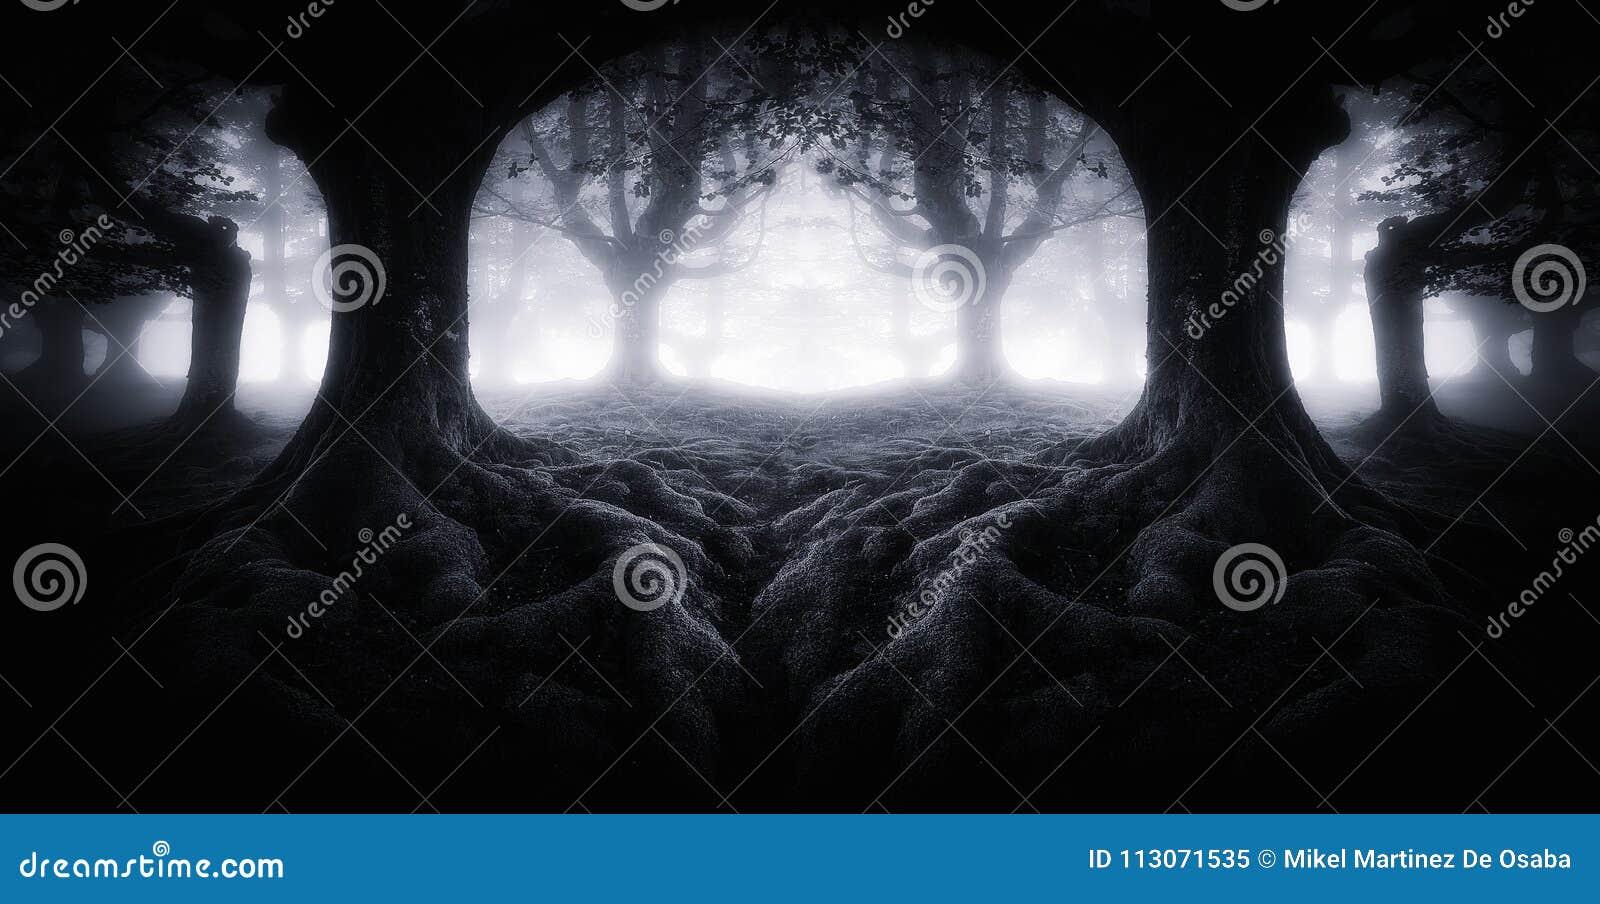 Eng donker bos met boomwortels